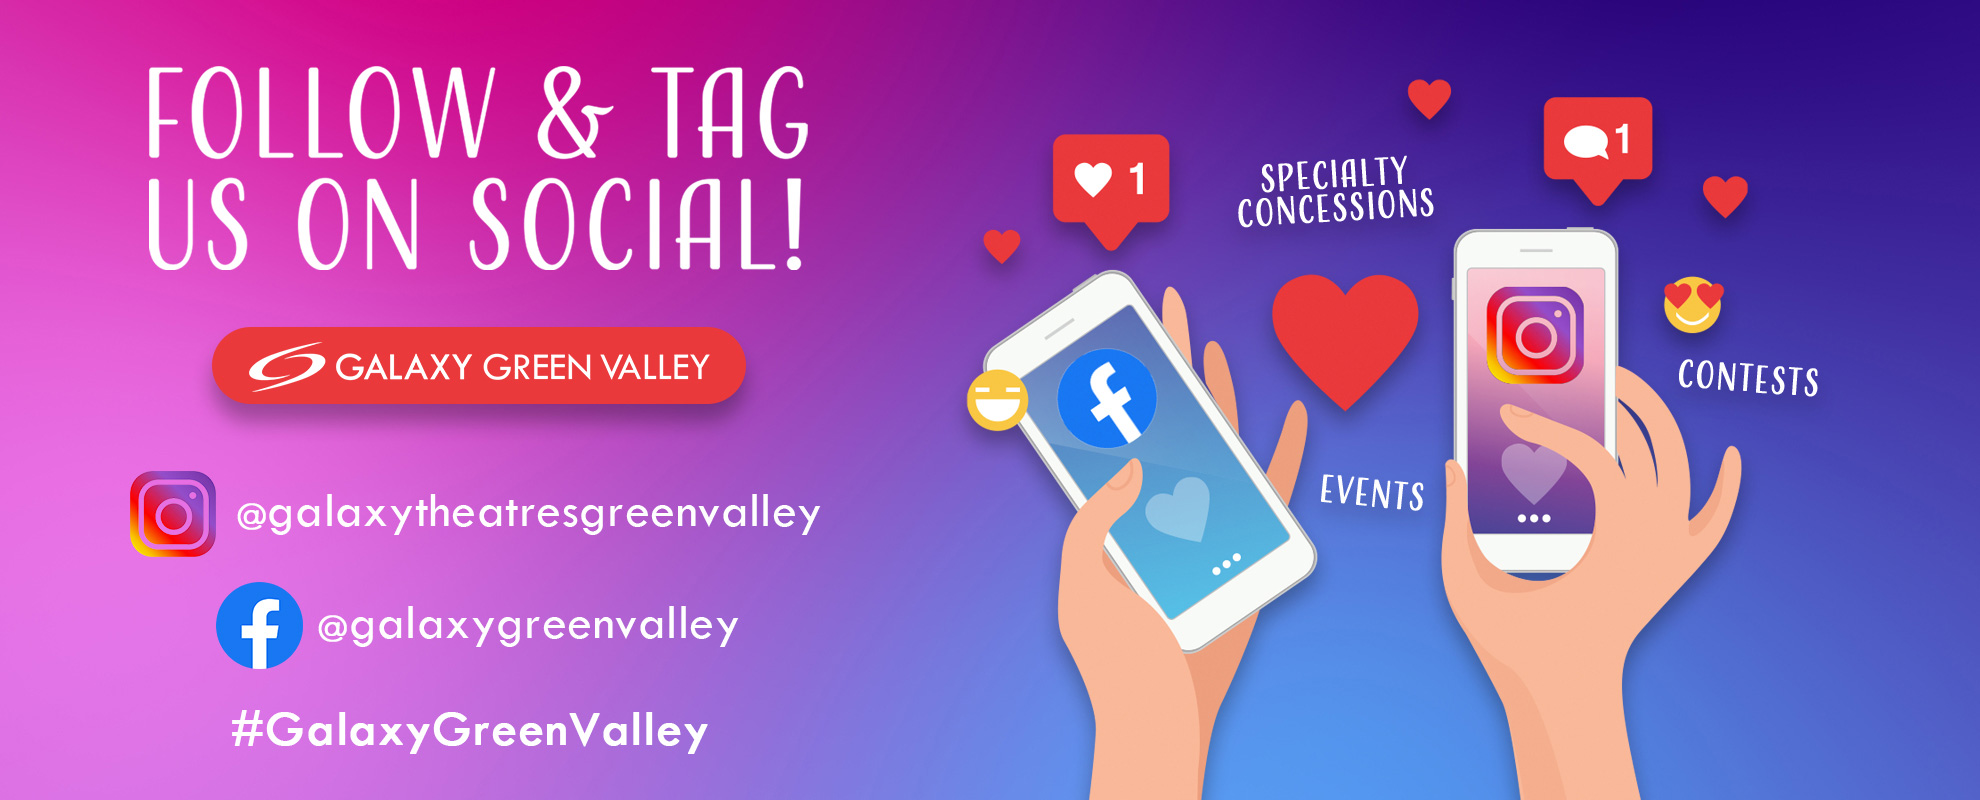 Socials/Hashtag - Green Valley image